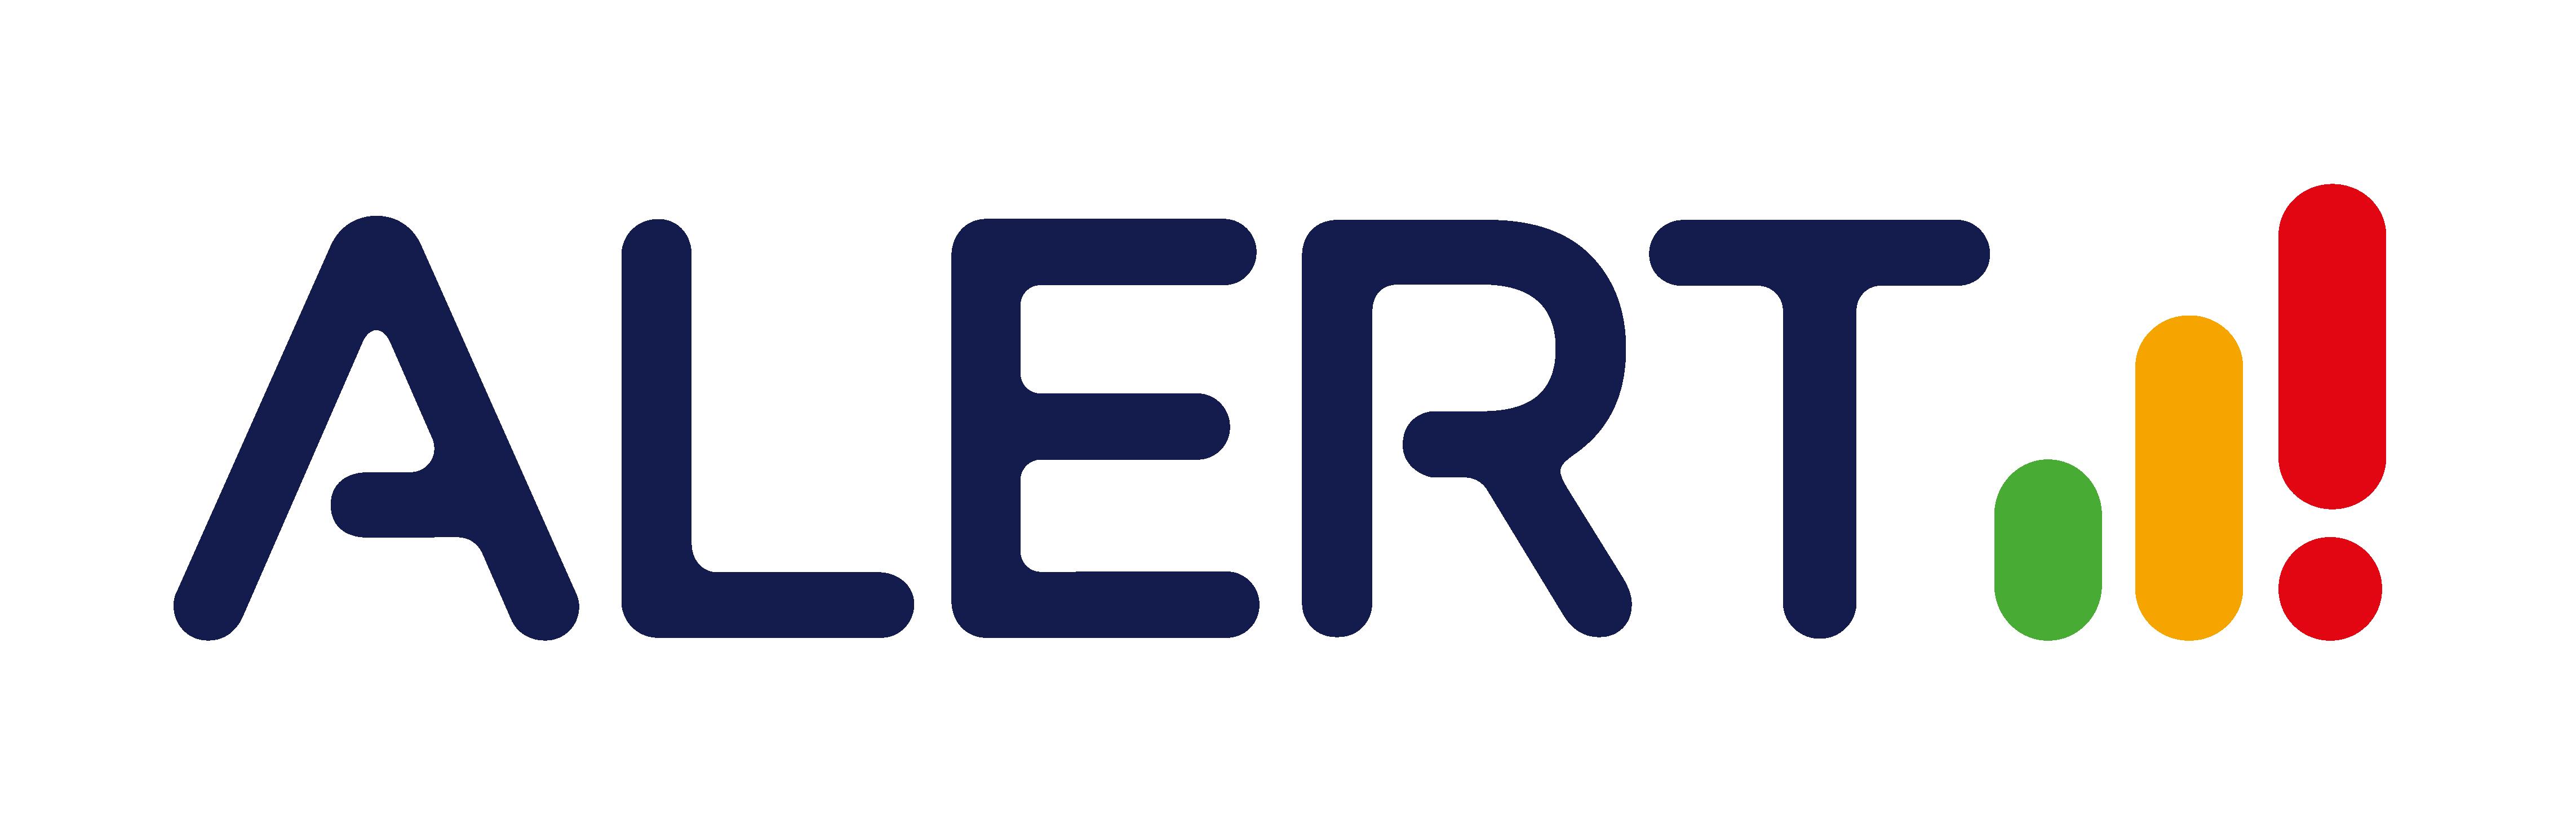 alert-logo-aw-blue.png